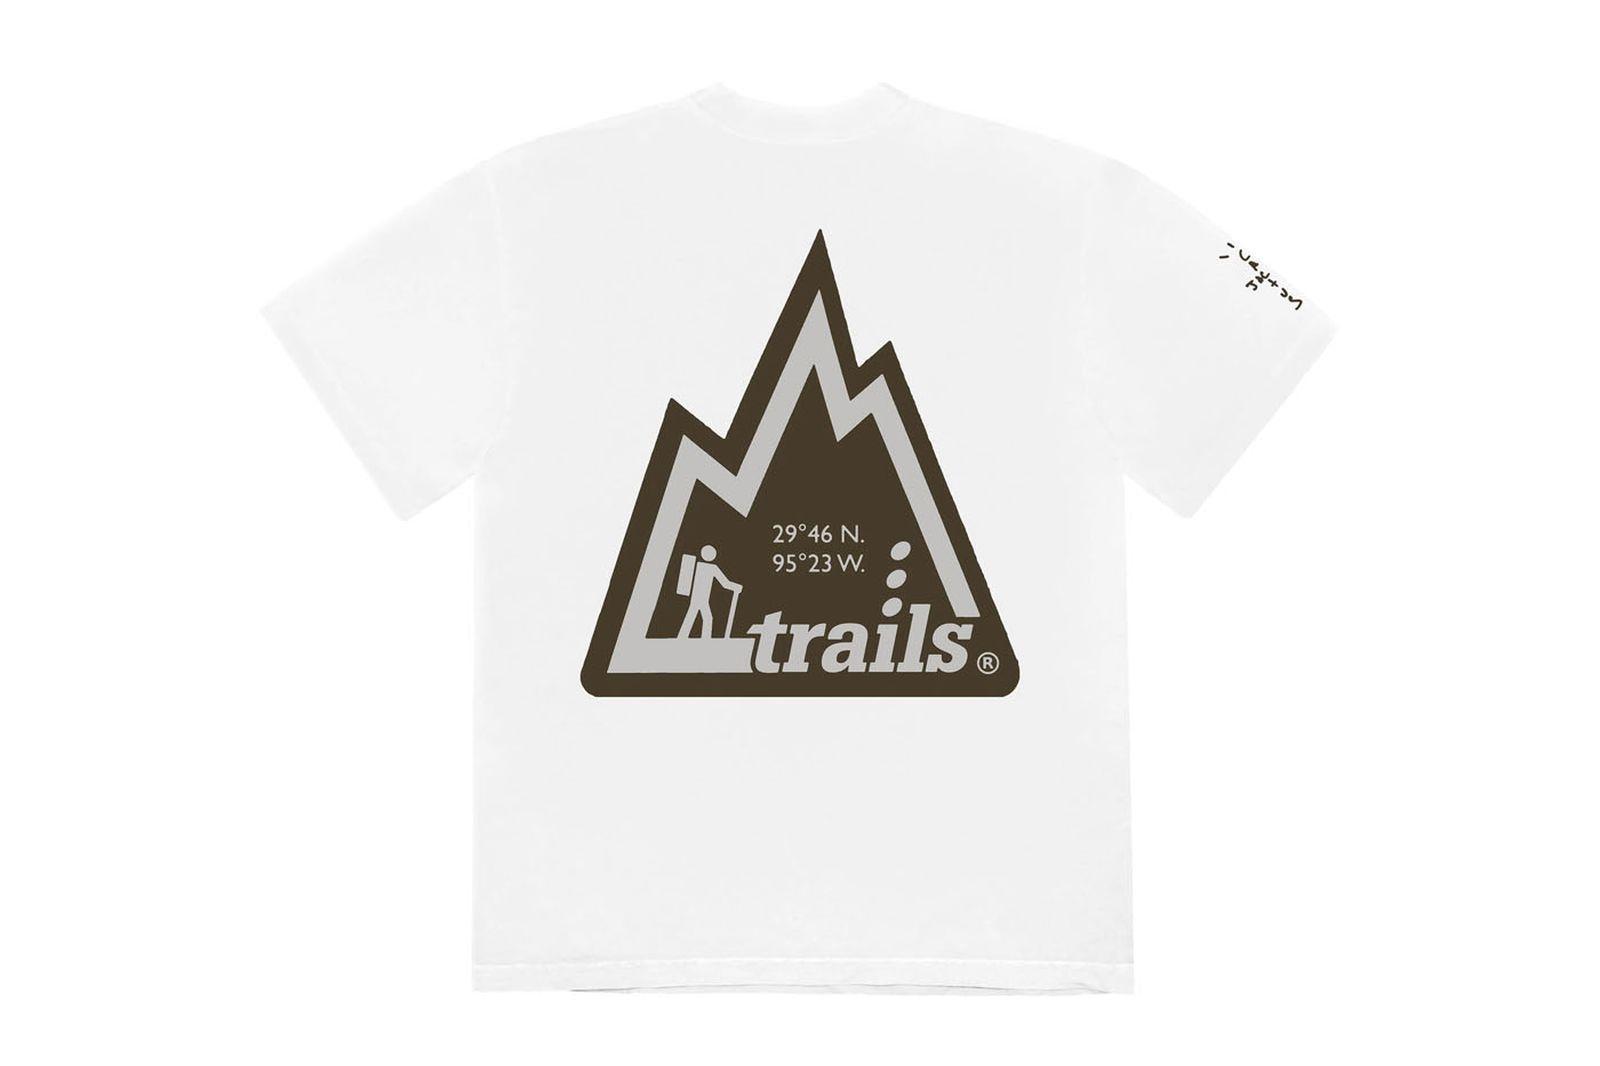 16travis-scott-cactus-trails-merch-may-2020